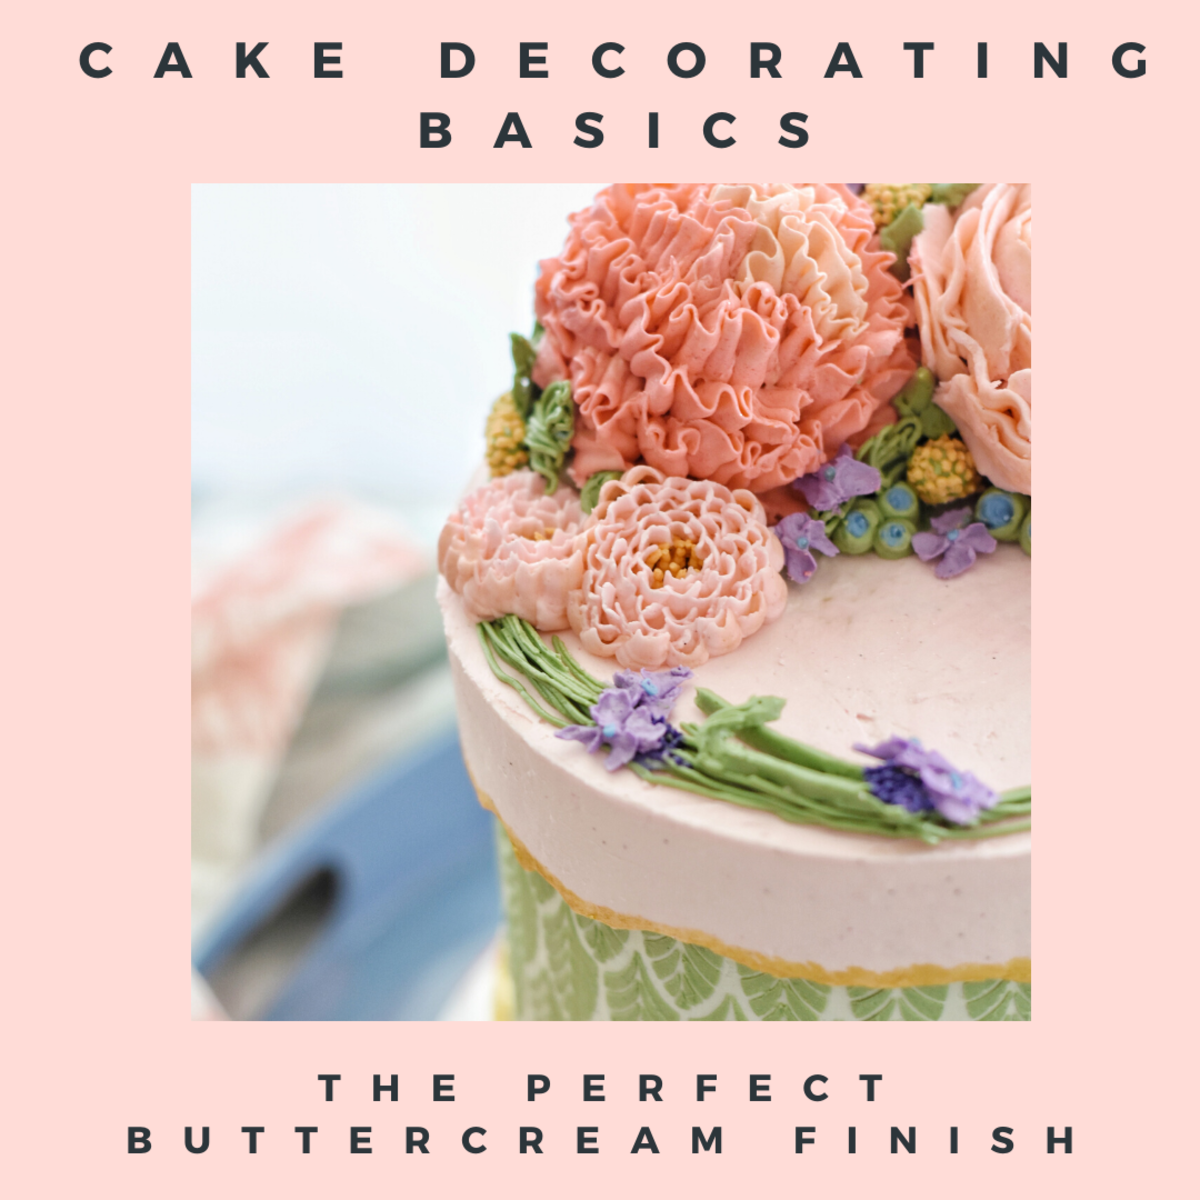 Cake Decorating Basics: How to Achieve the Perfect Buttercream Finish